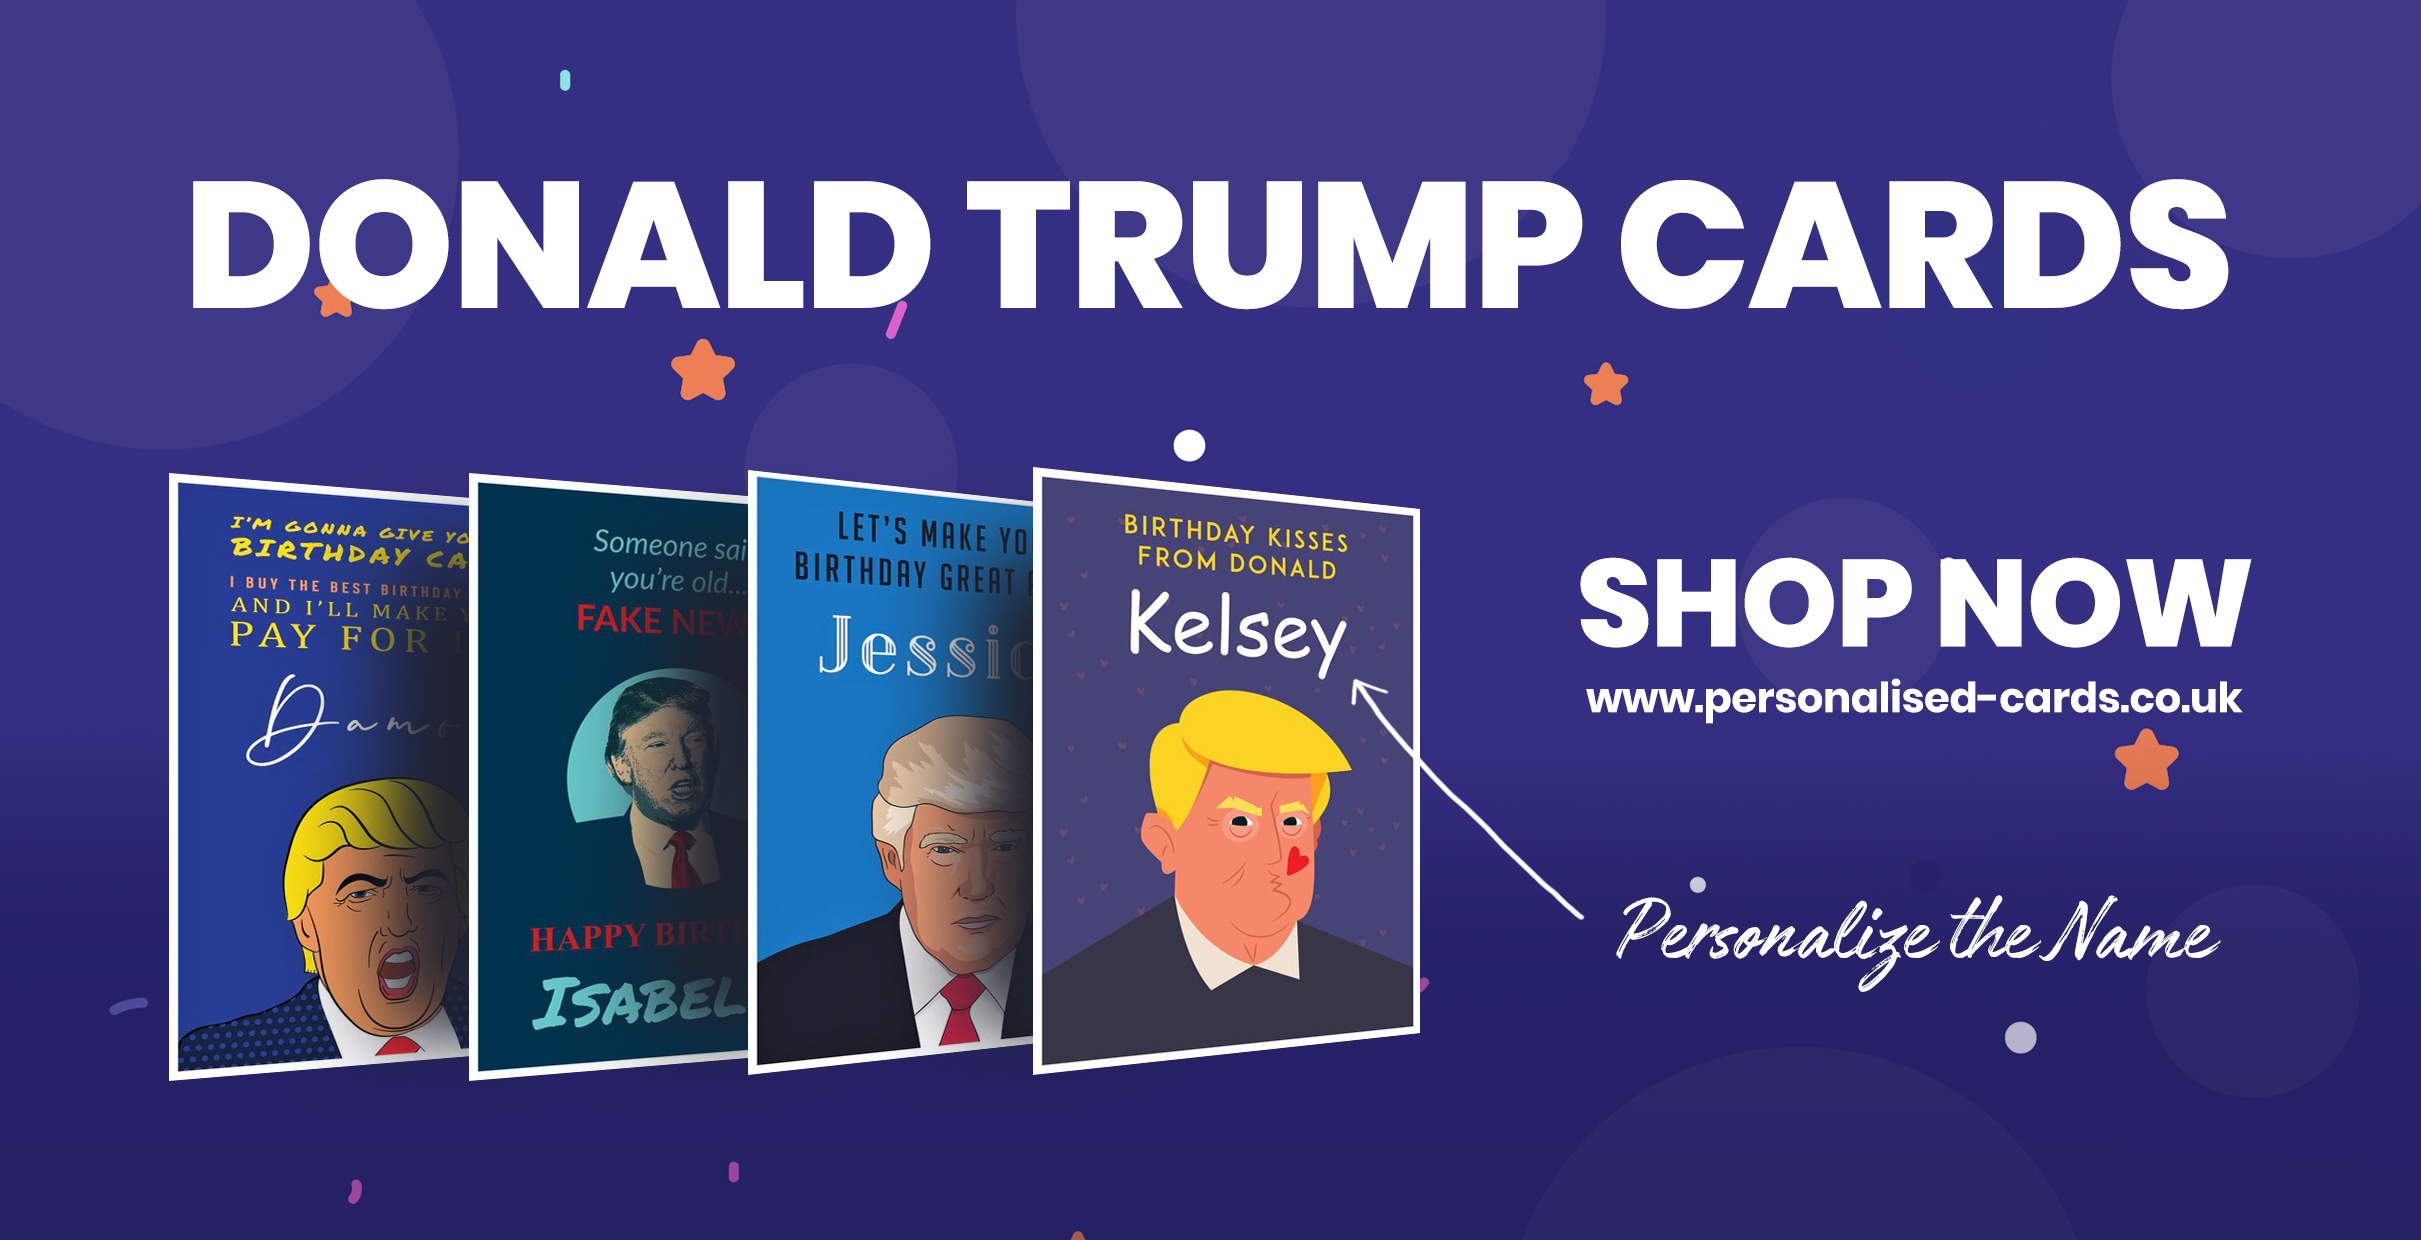 donald-trump-cards.jpg